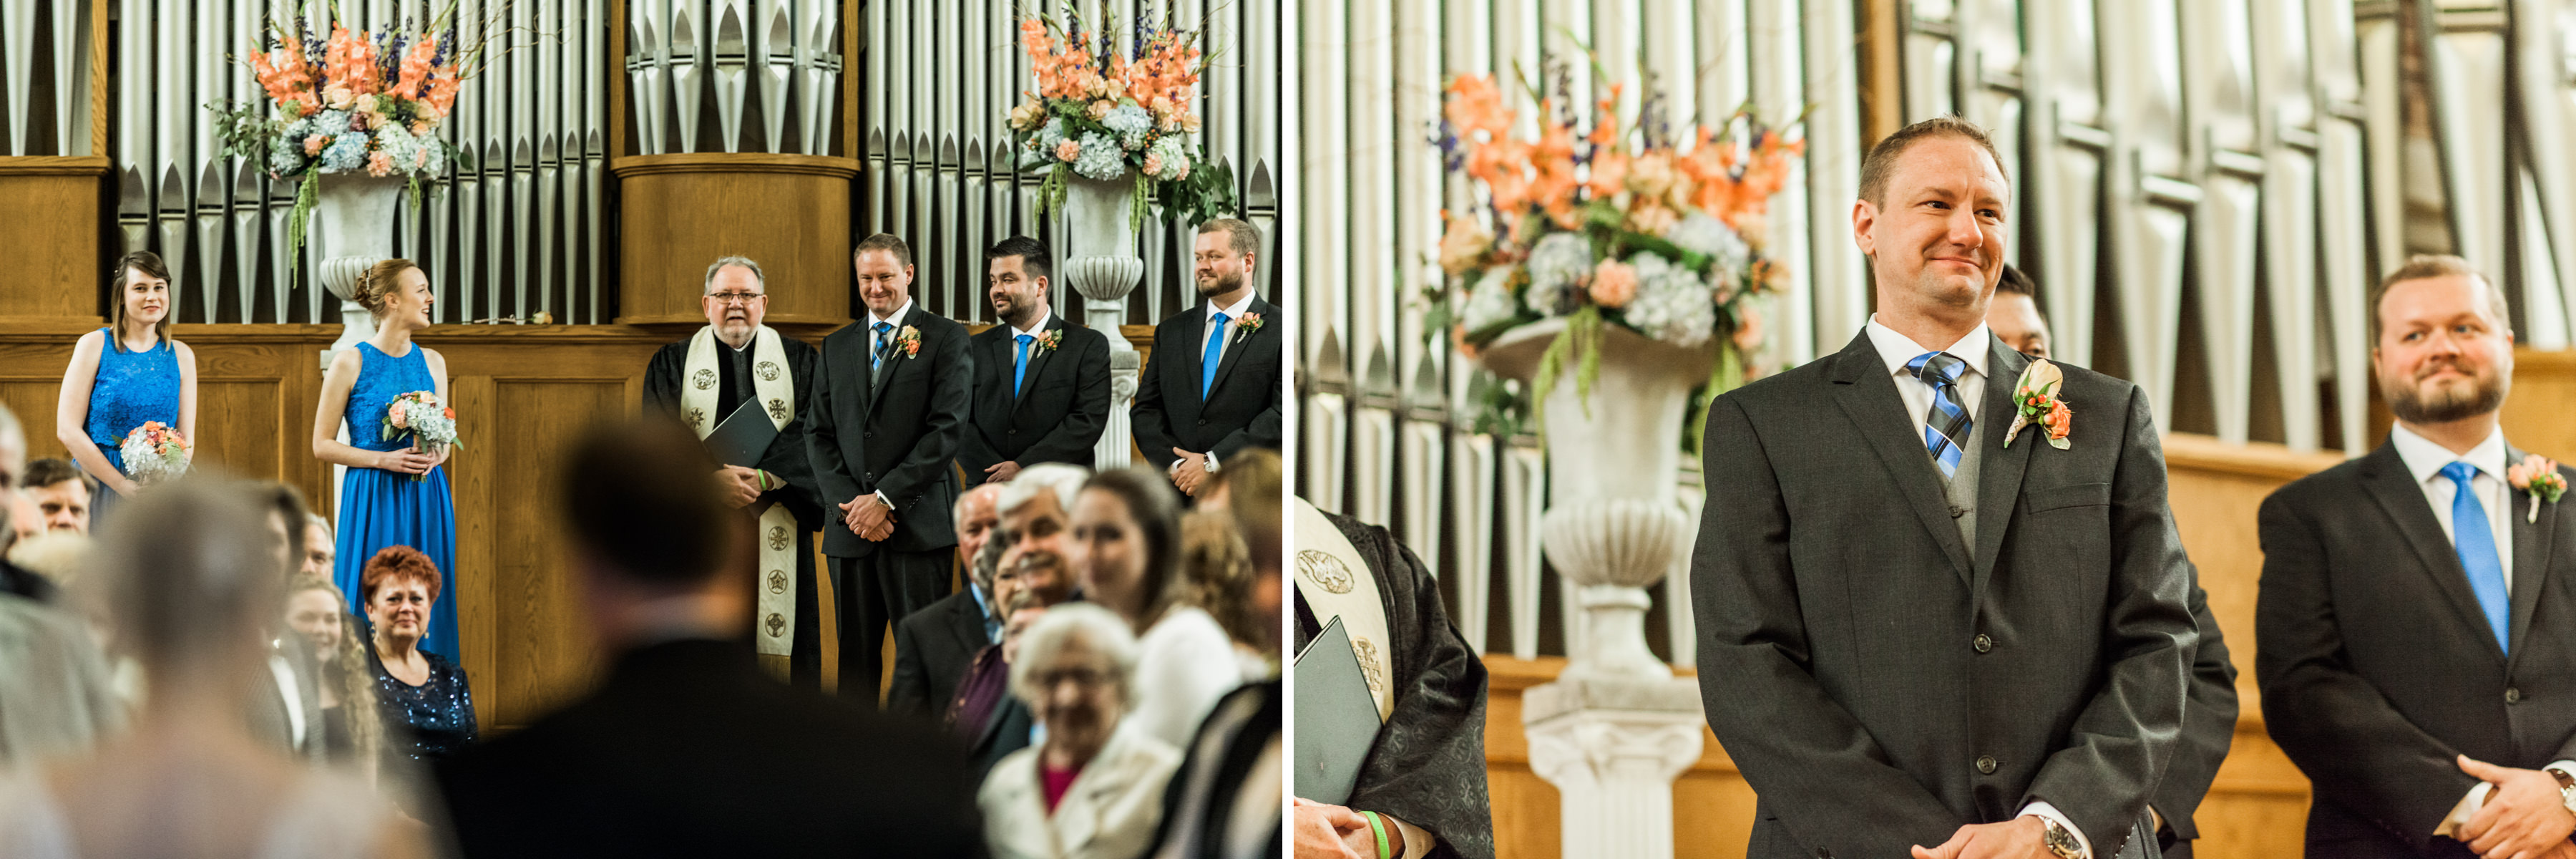 MAULDIN_WEDDING_MONTGOMERY_ALABAMA_WEDDING_PHOTOGRAPHY_60